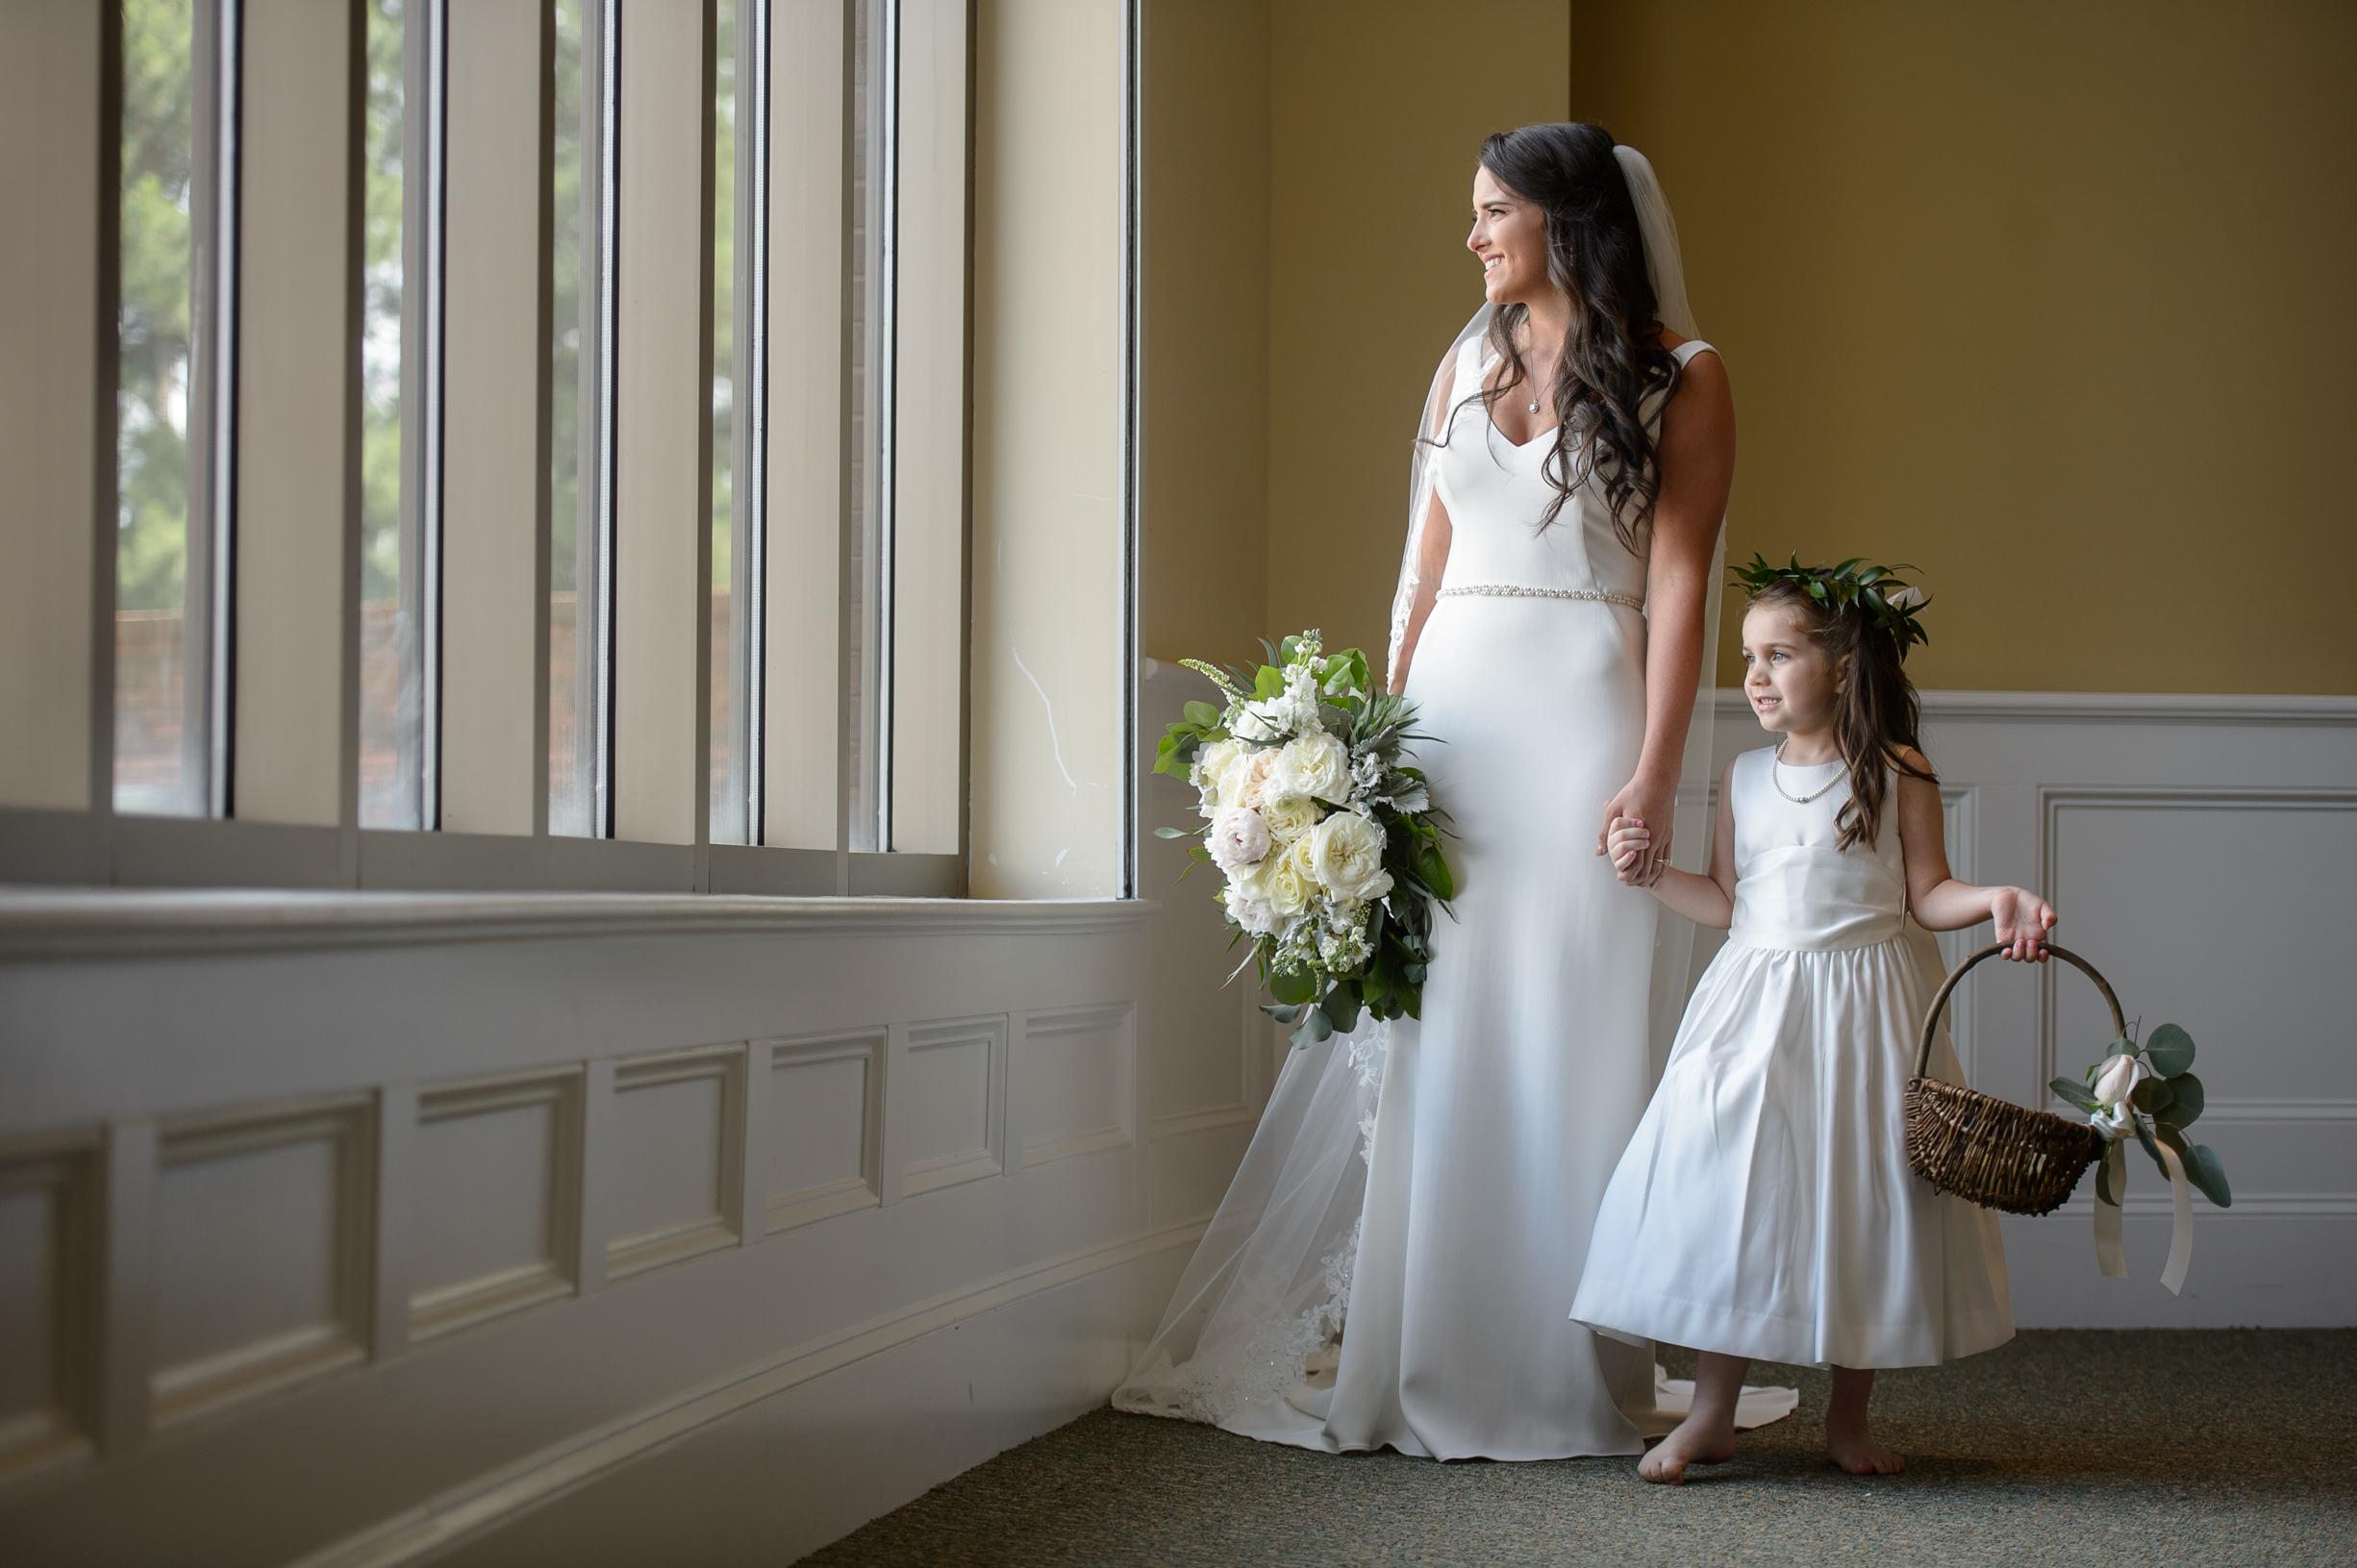 Royal Wedding with Outdoor Reception-22.JPG